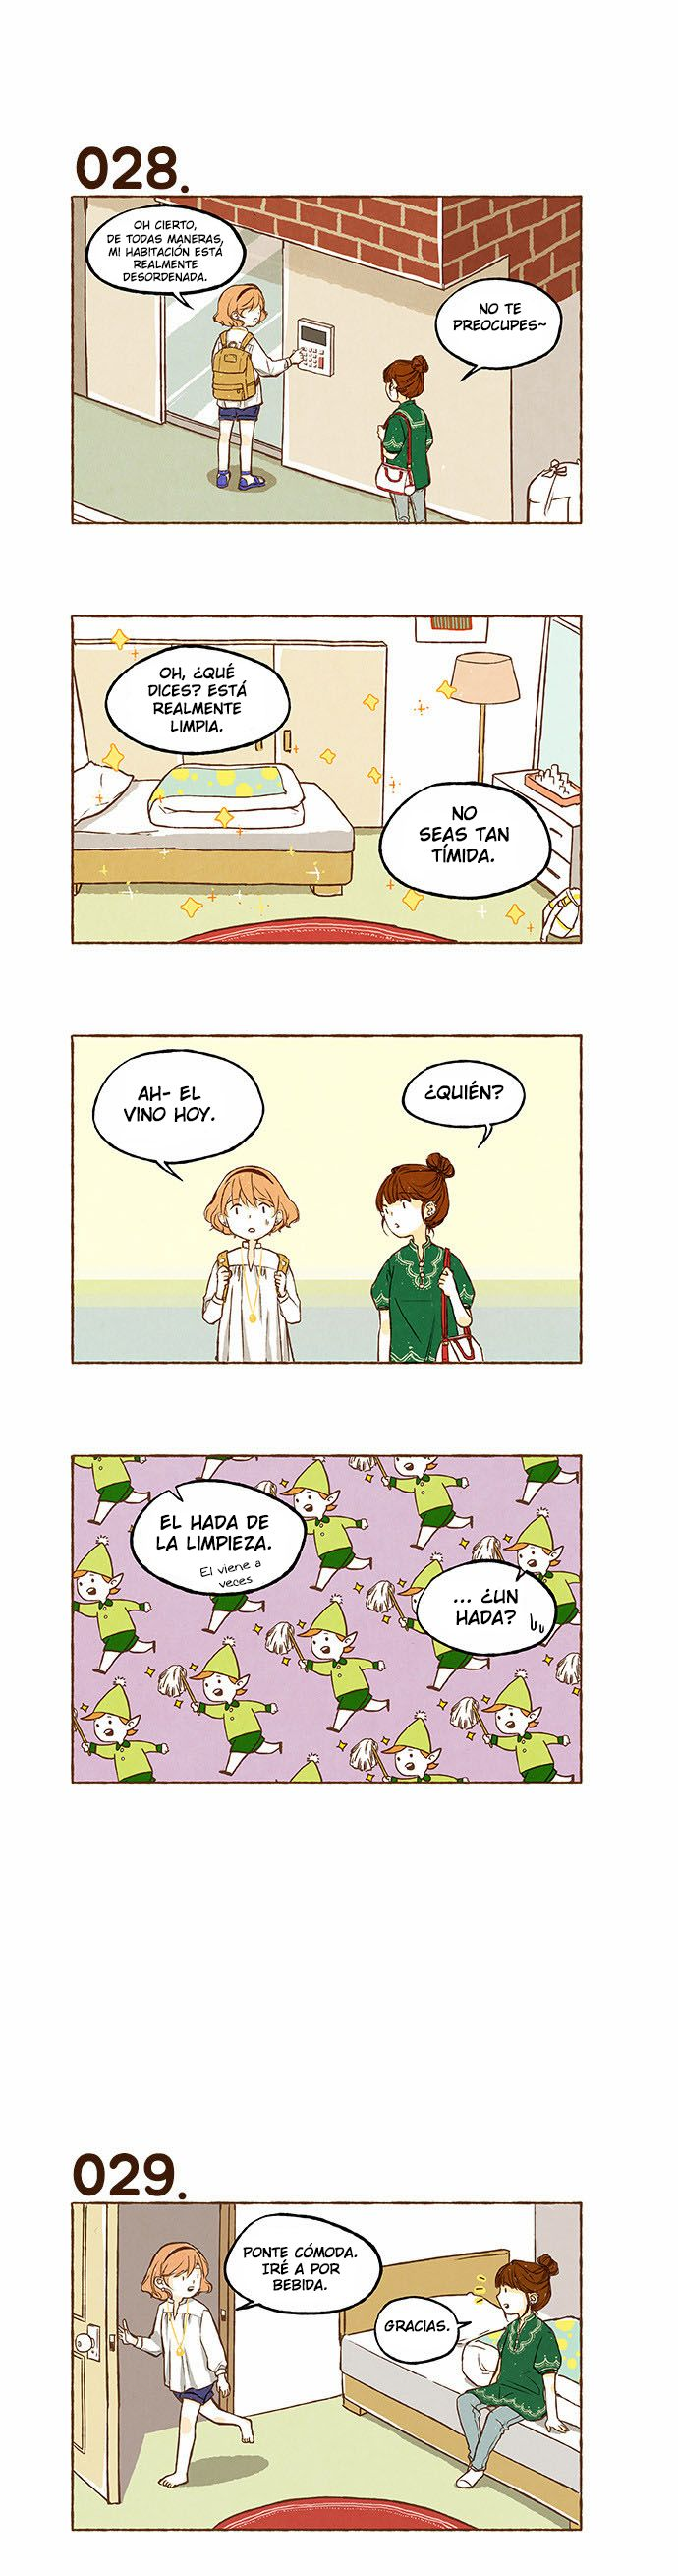 http://c5.ninemanga.com/es_manga/61/17725/462953/4a4f4f65ef2a9aca173a0acd6311c724.jpg Page 5